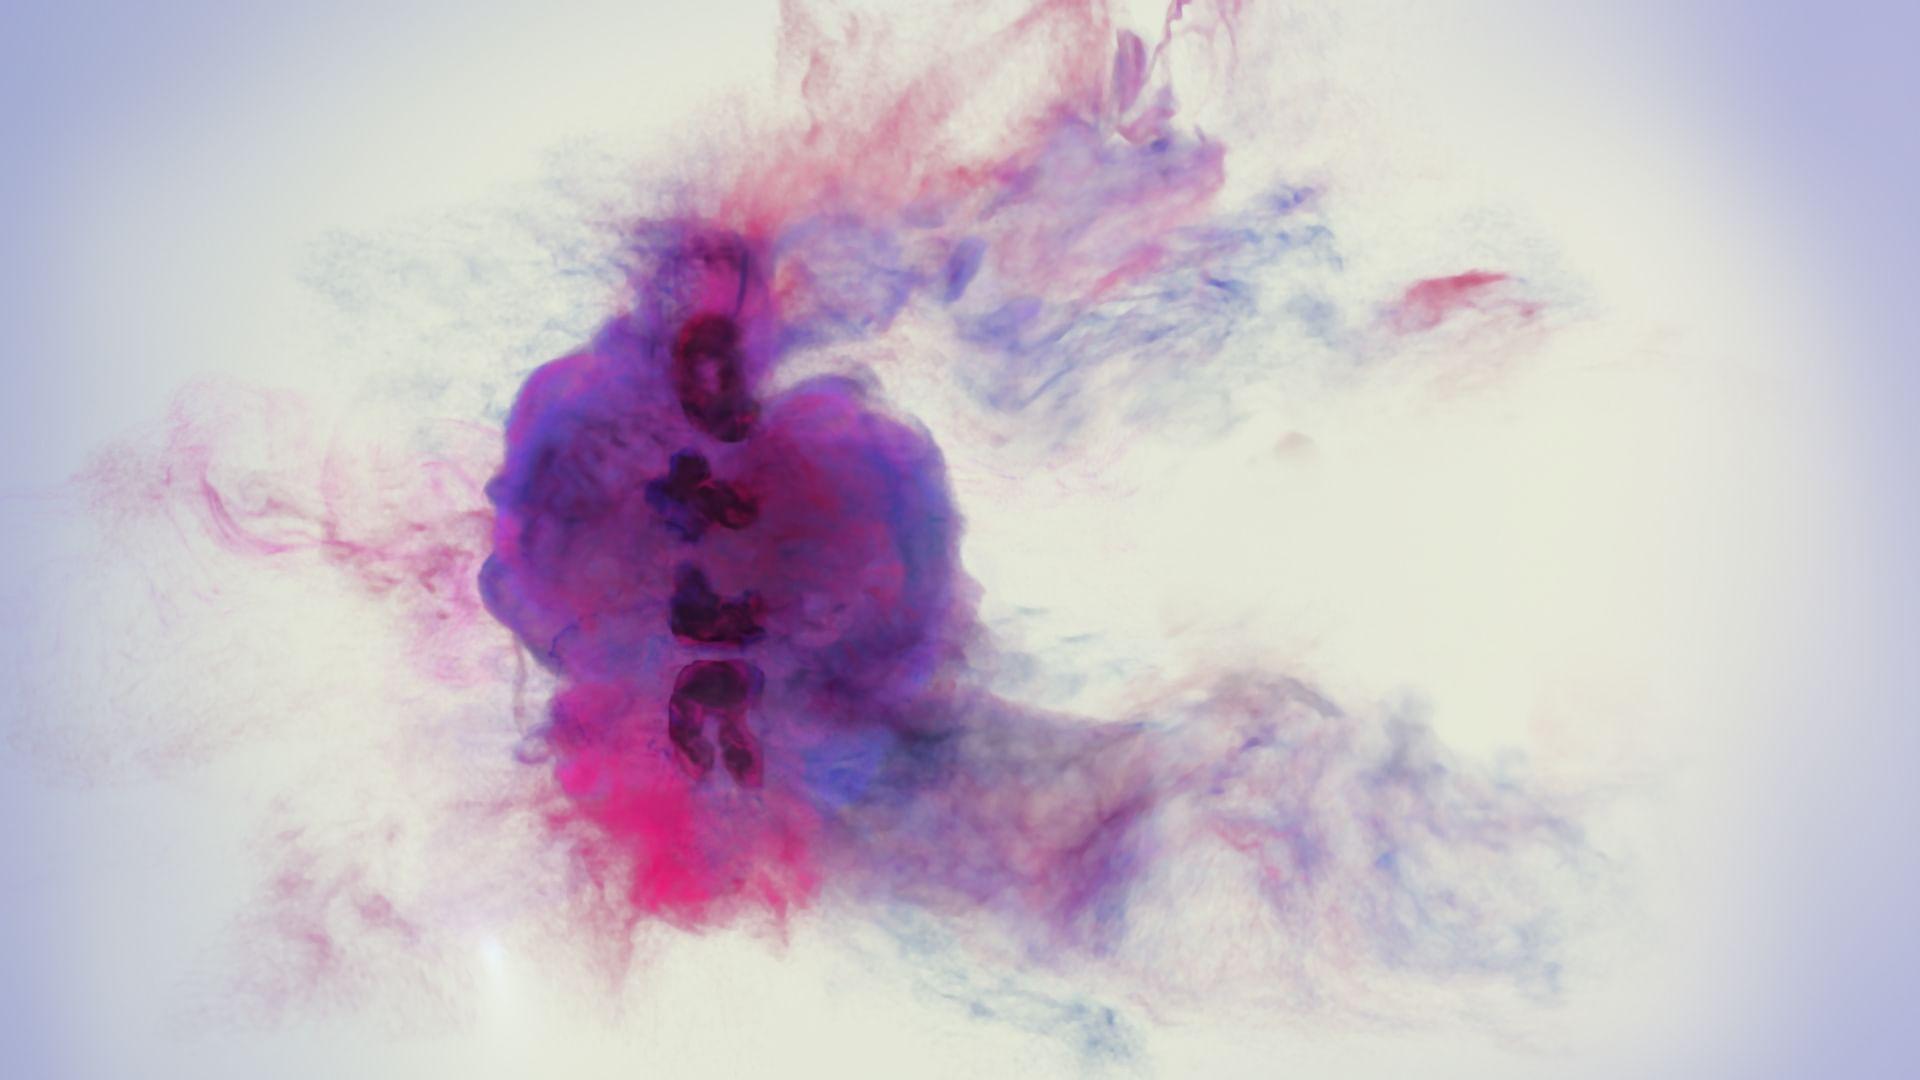 """Donkeyote"", ein Film von Chico Pereira"